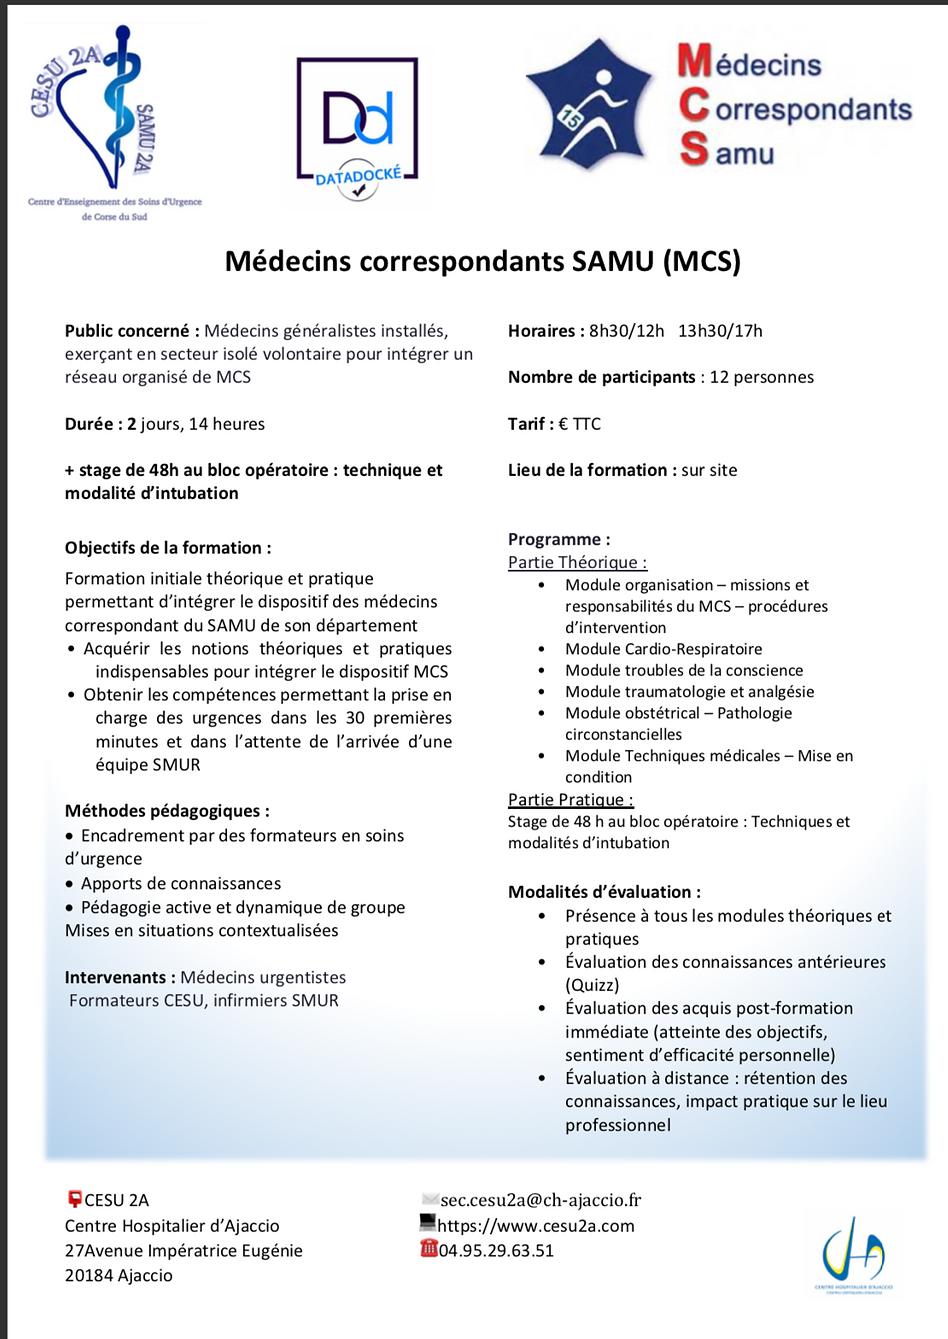 Medecins Correspondants SAMU MCS.png